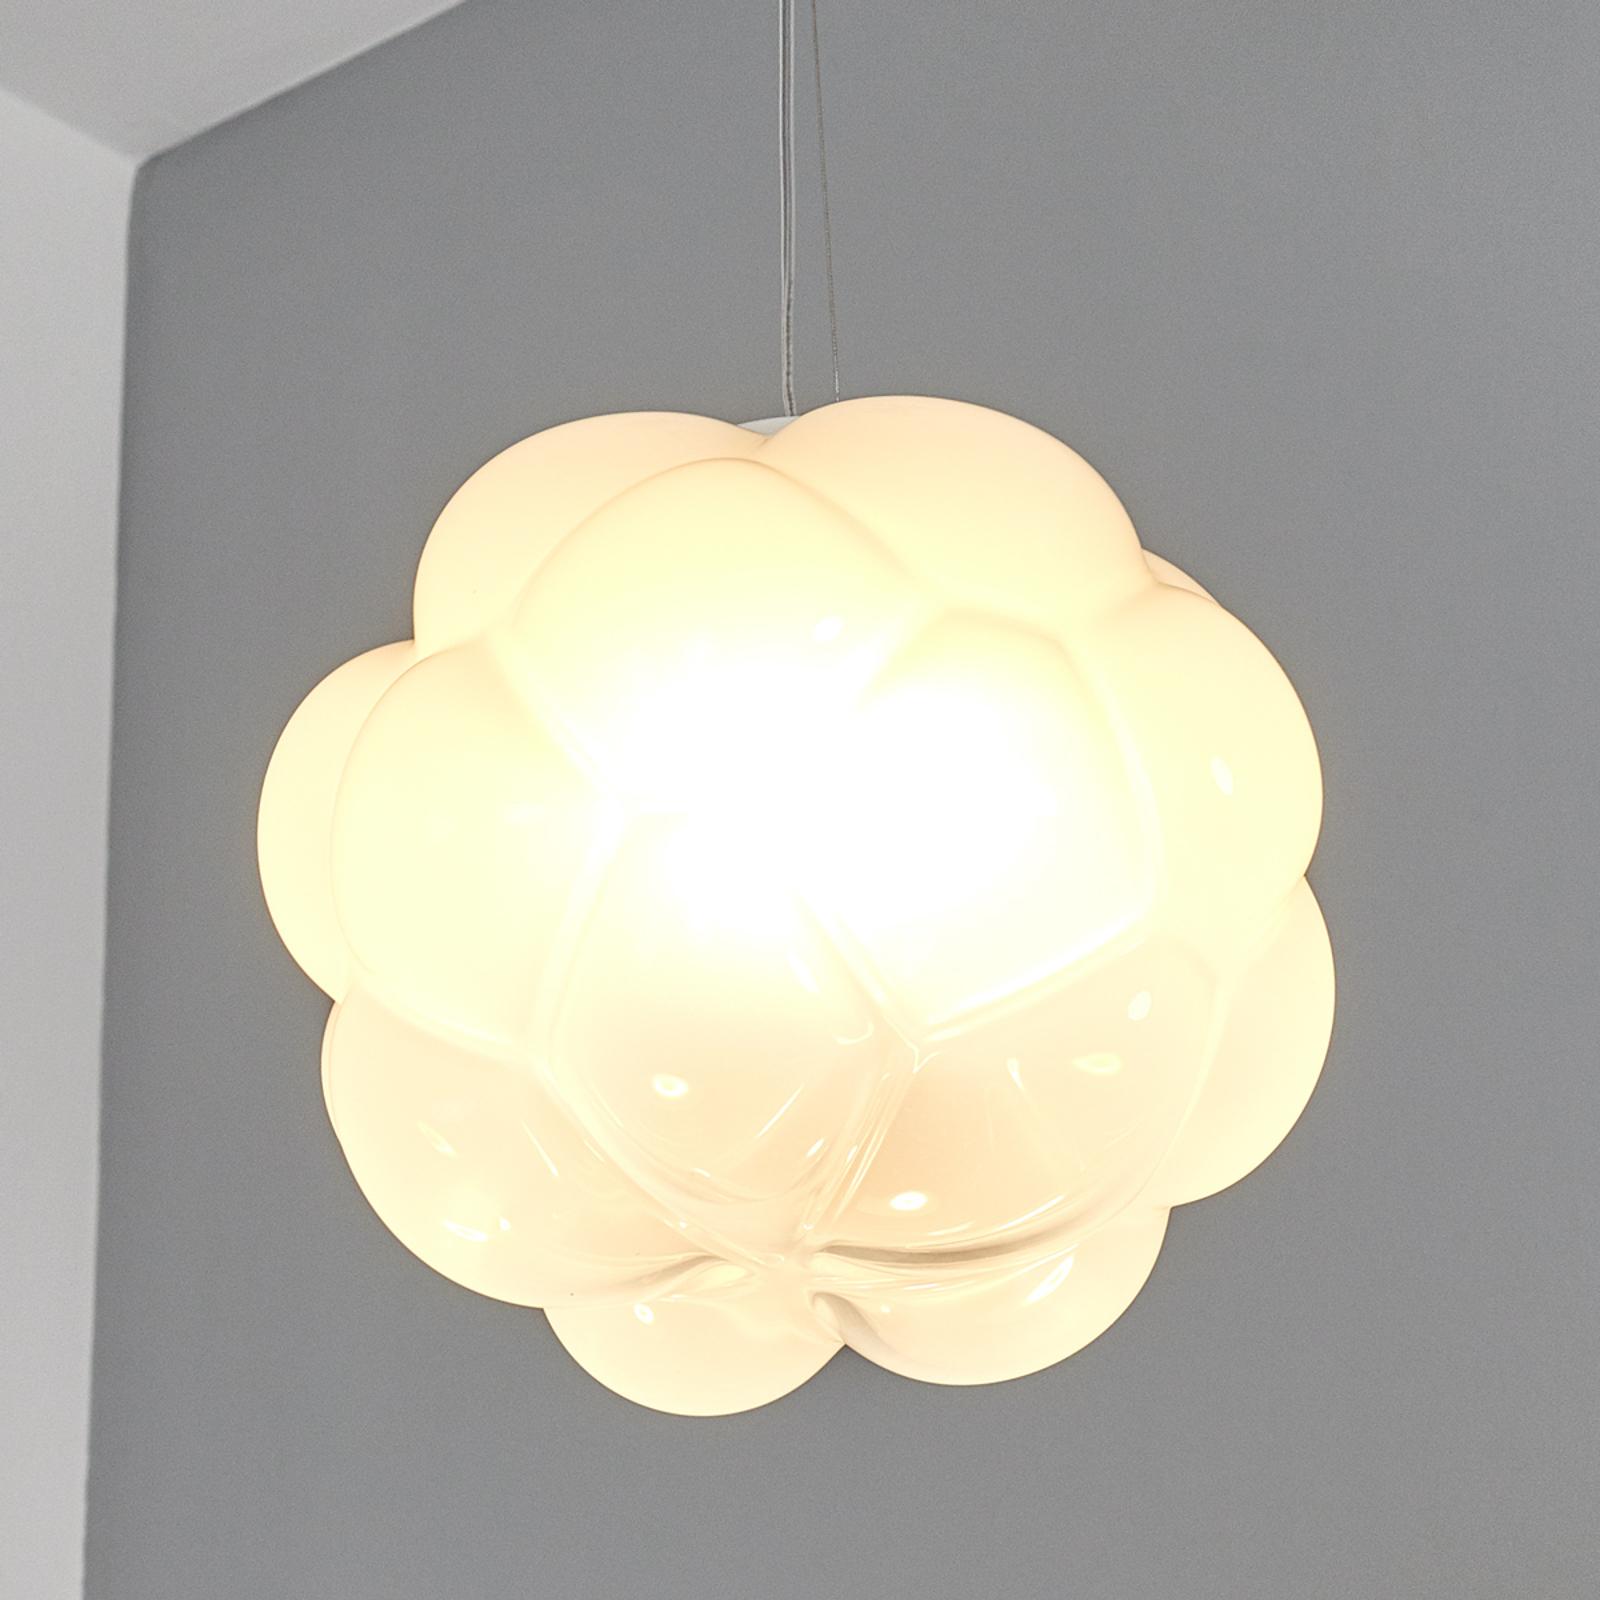 Fabbian Cloudy - LED-Hängeleuchte Wolkenform 26 cm